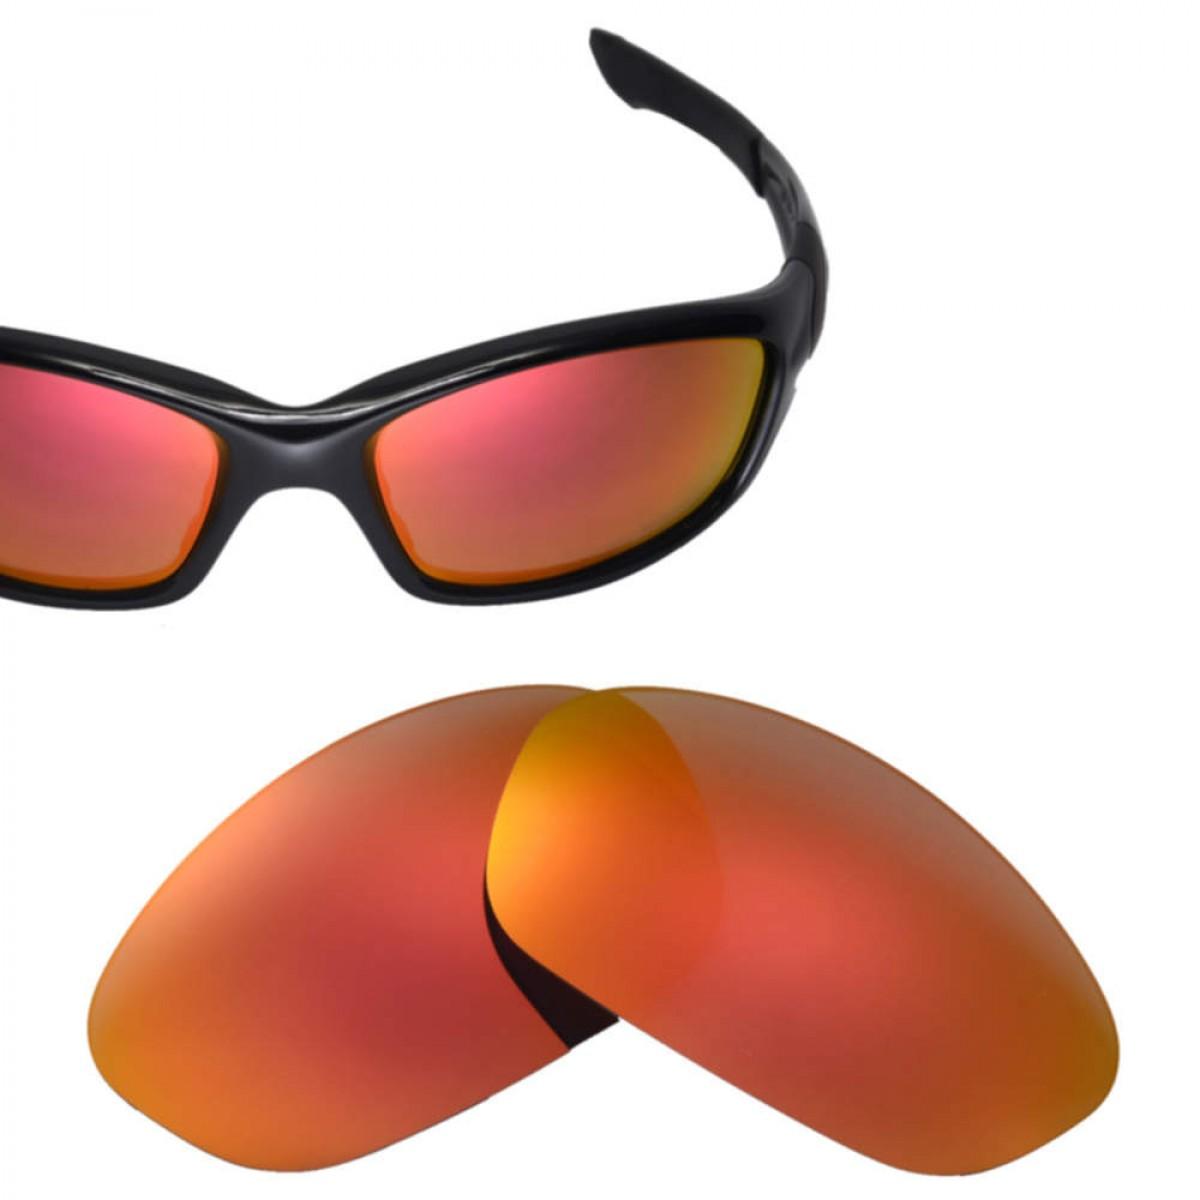 9d2b4e7d34b37 Cofery Lenses Store Cofery Replacement Lenses for Oakley Straight Jacket  Sunglasses